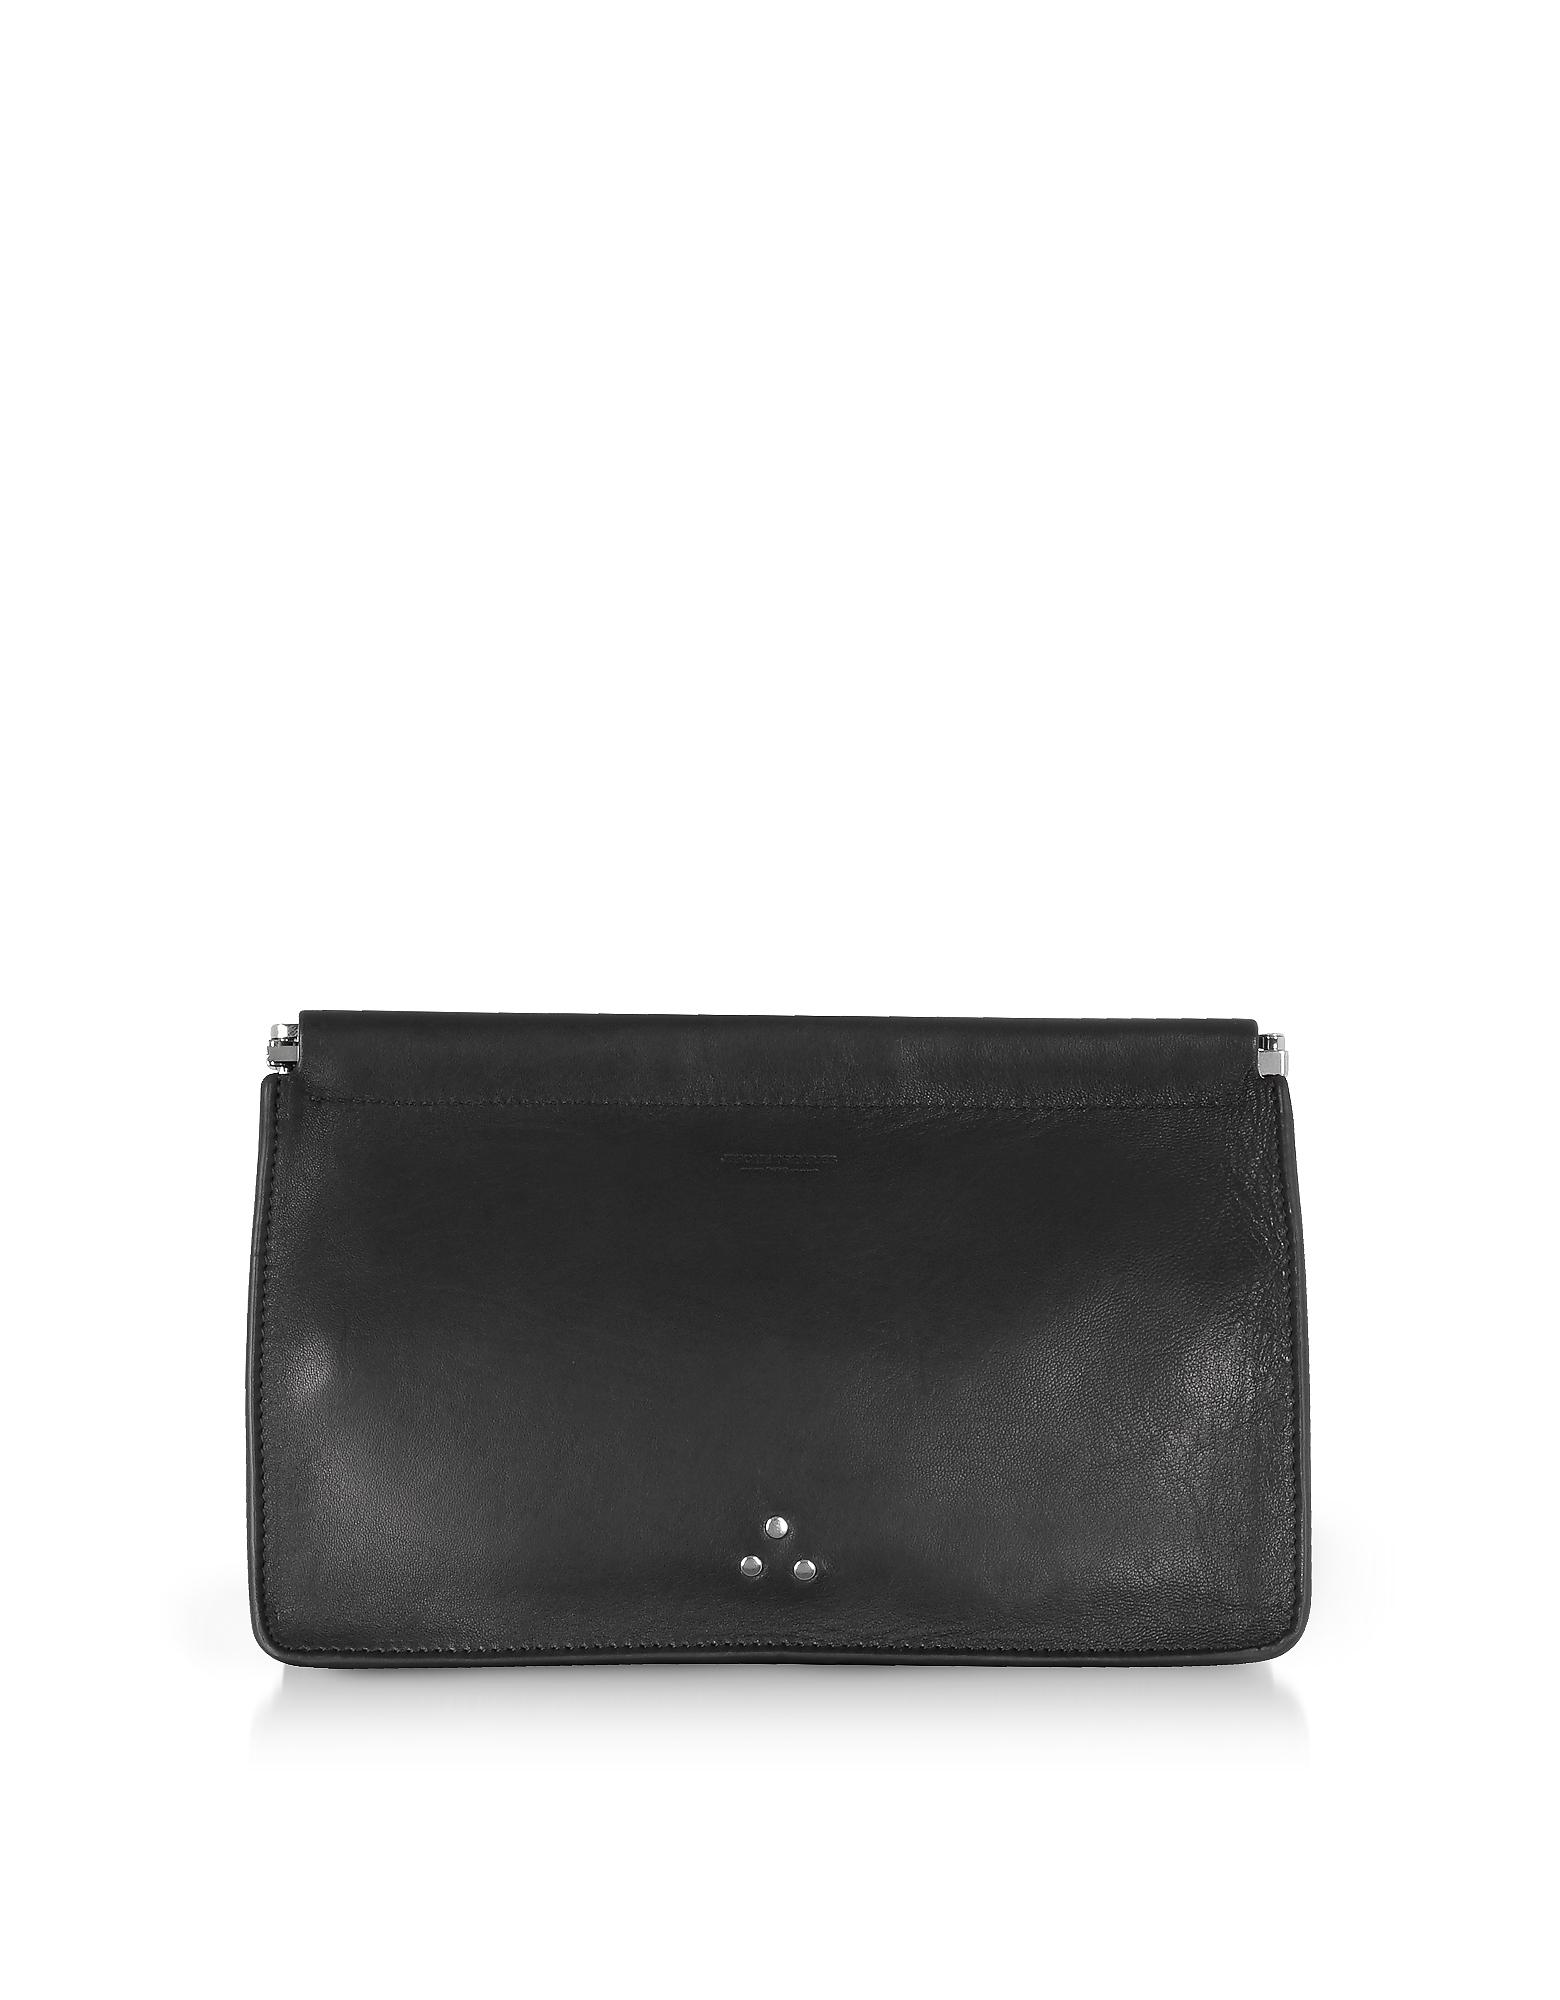 Image of Jerome Dreyfuss Designer Handbags, Popoche Clic Clac Large Black Leather Clutch